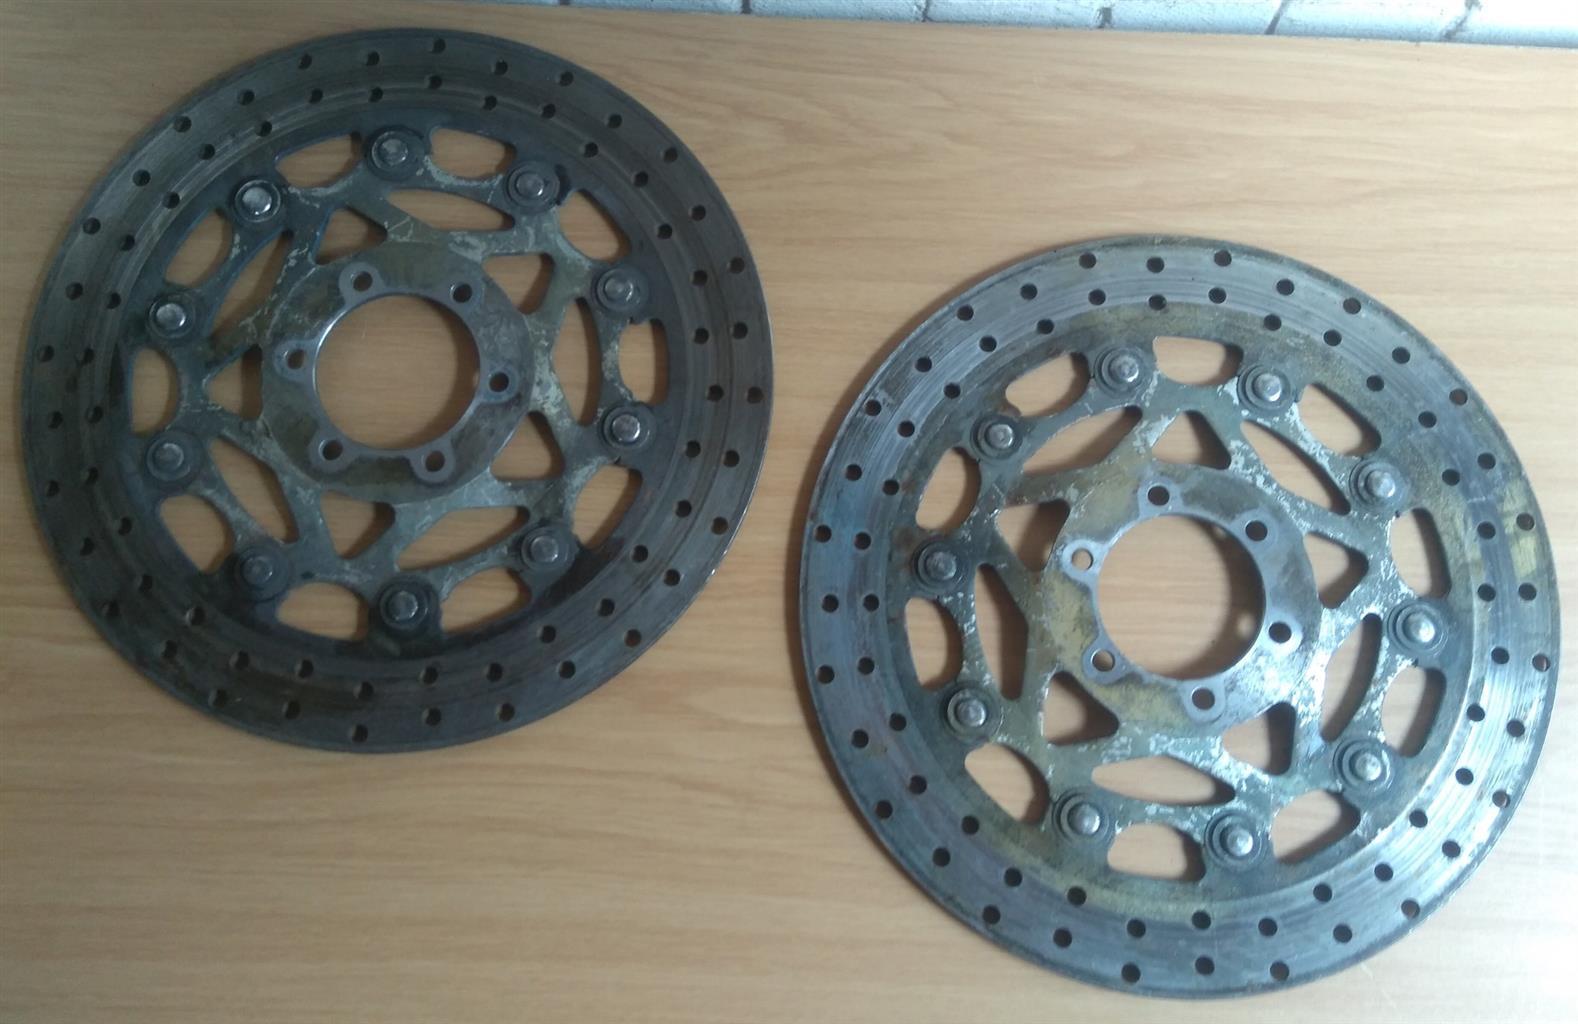 Yamaha FZR1000 Spare Parts Available